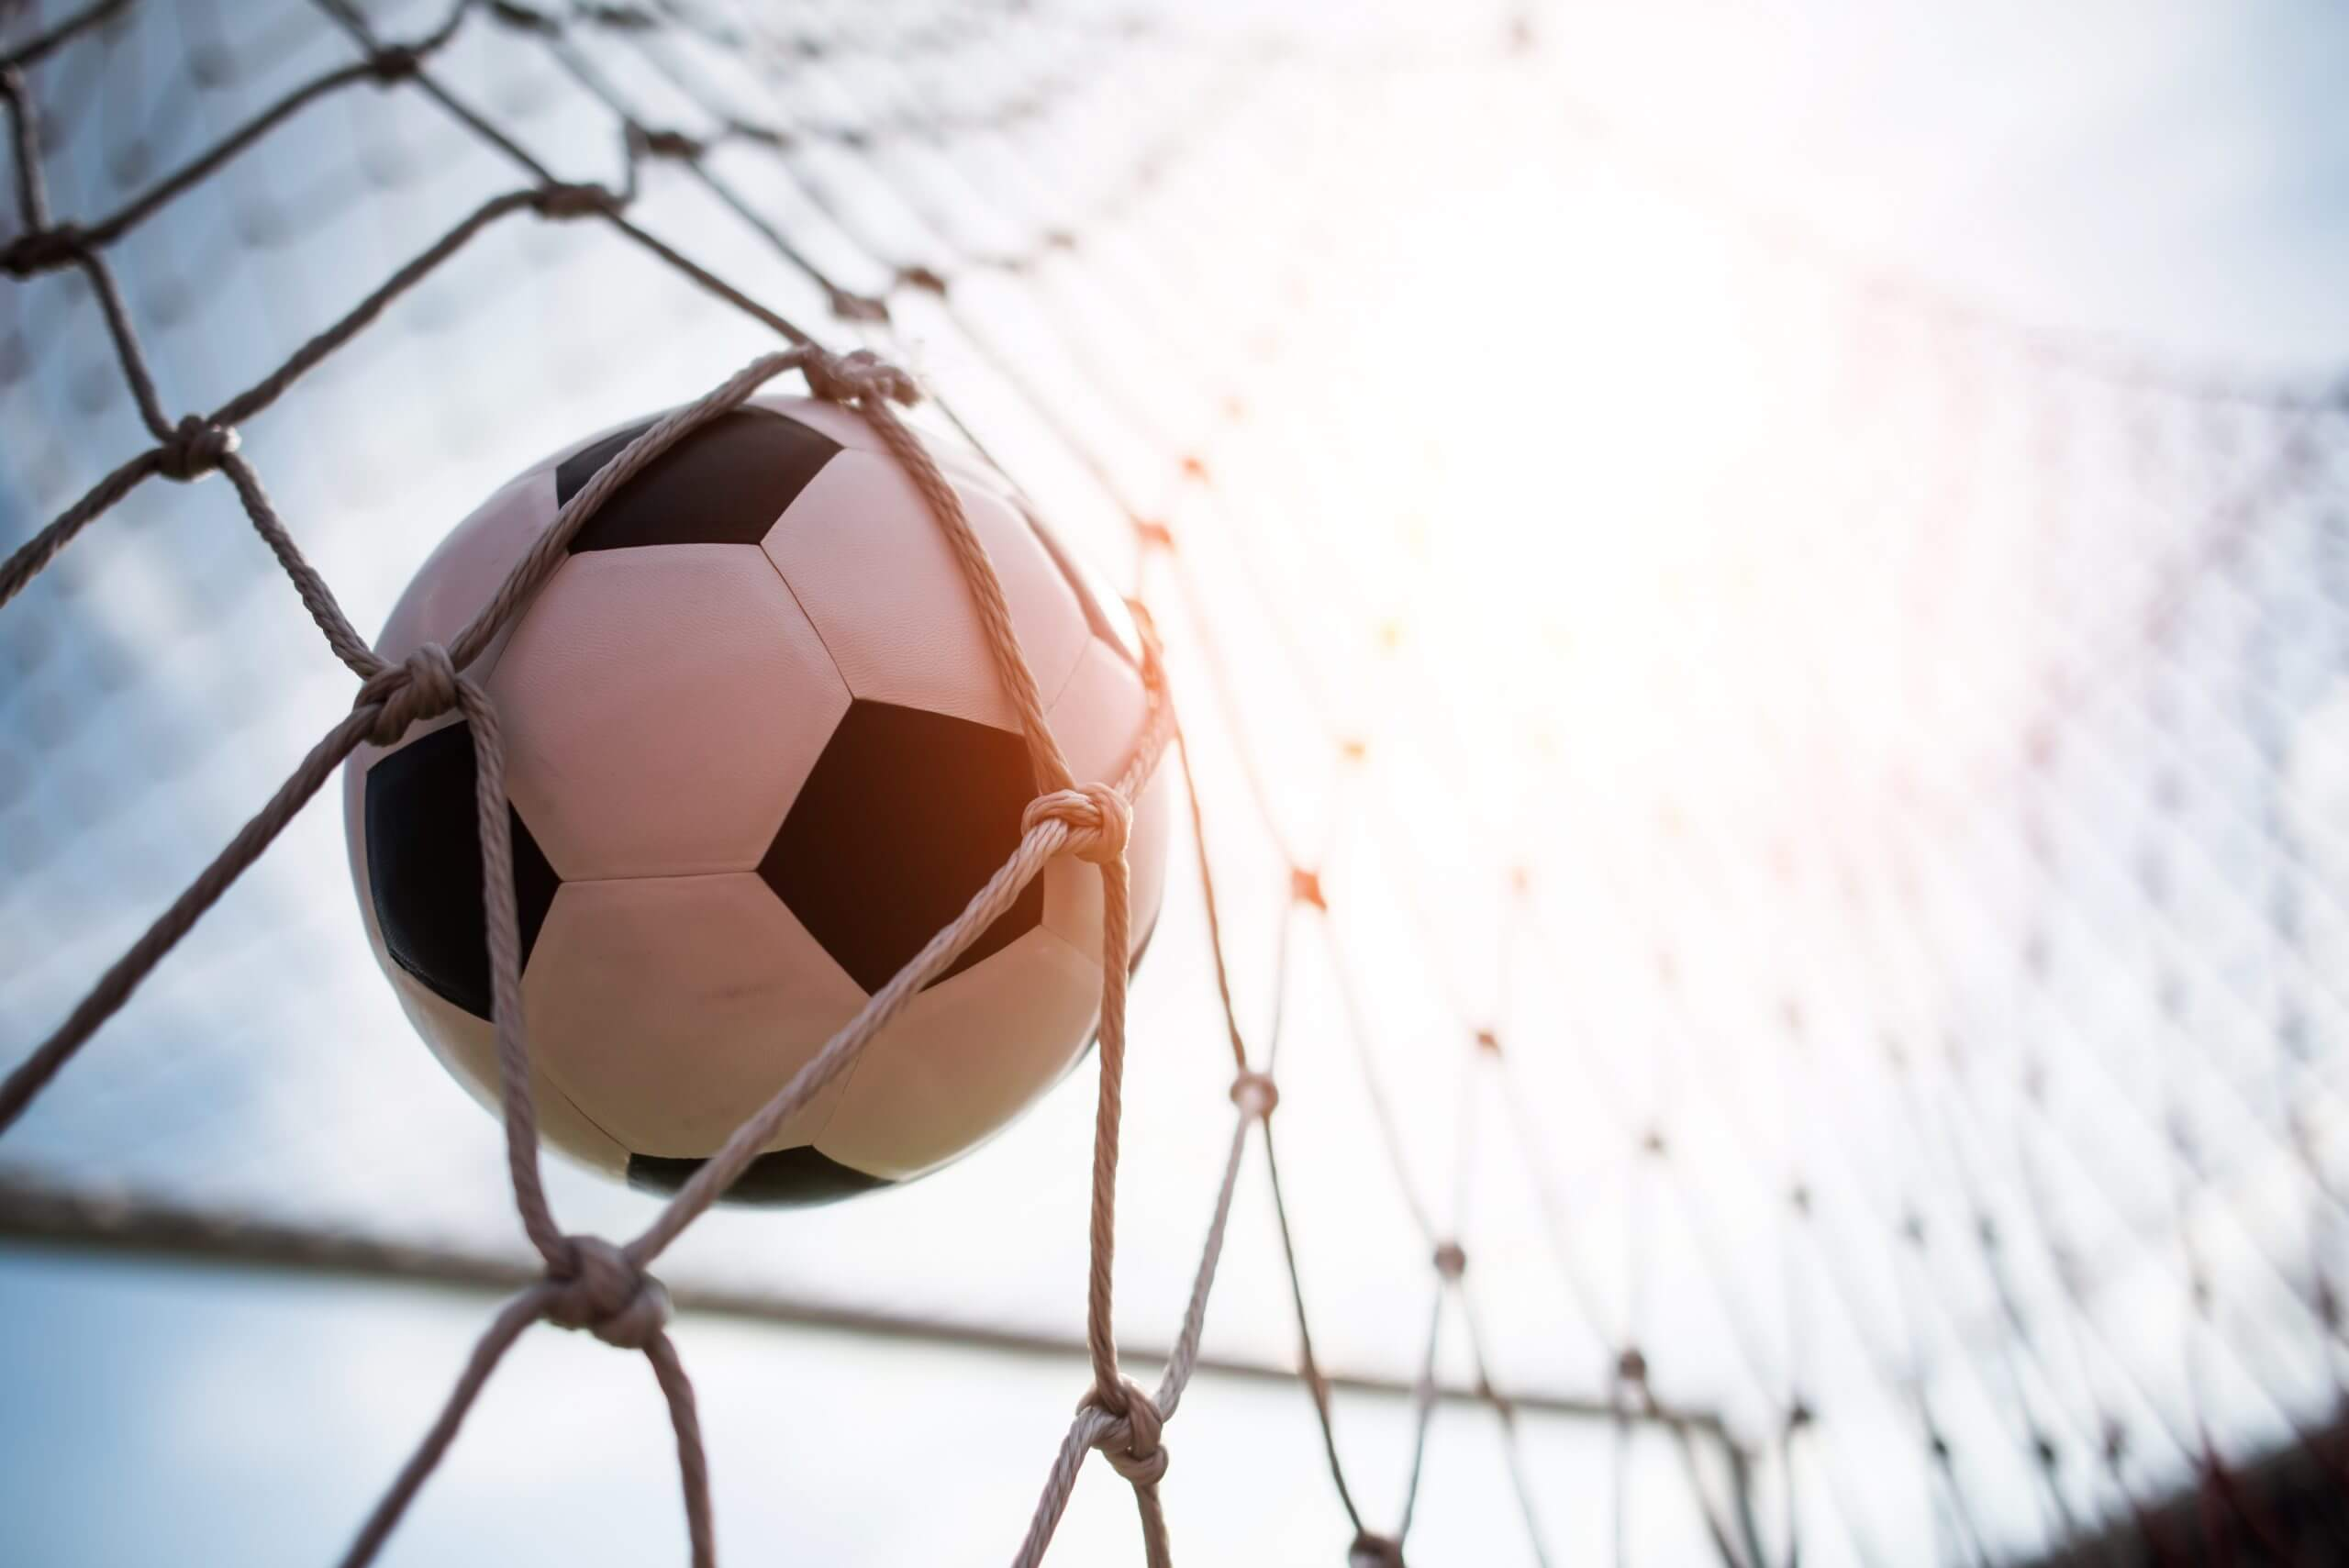 Guia do Cartola FC 2020 e scouter